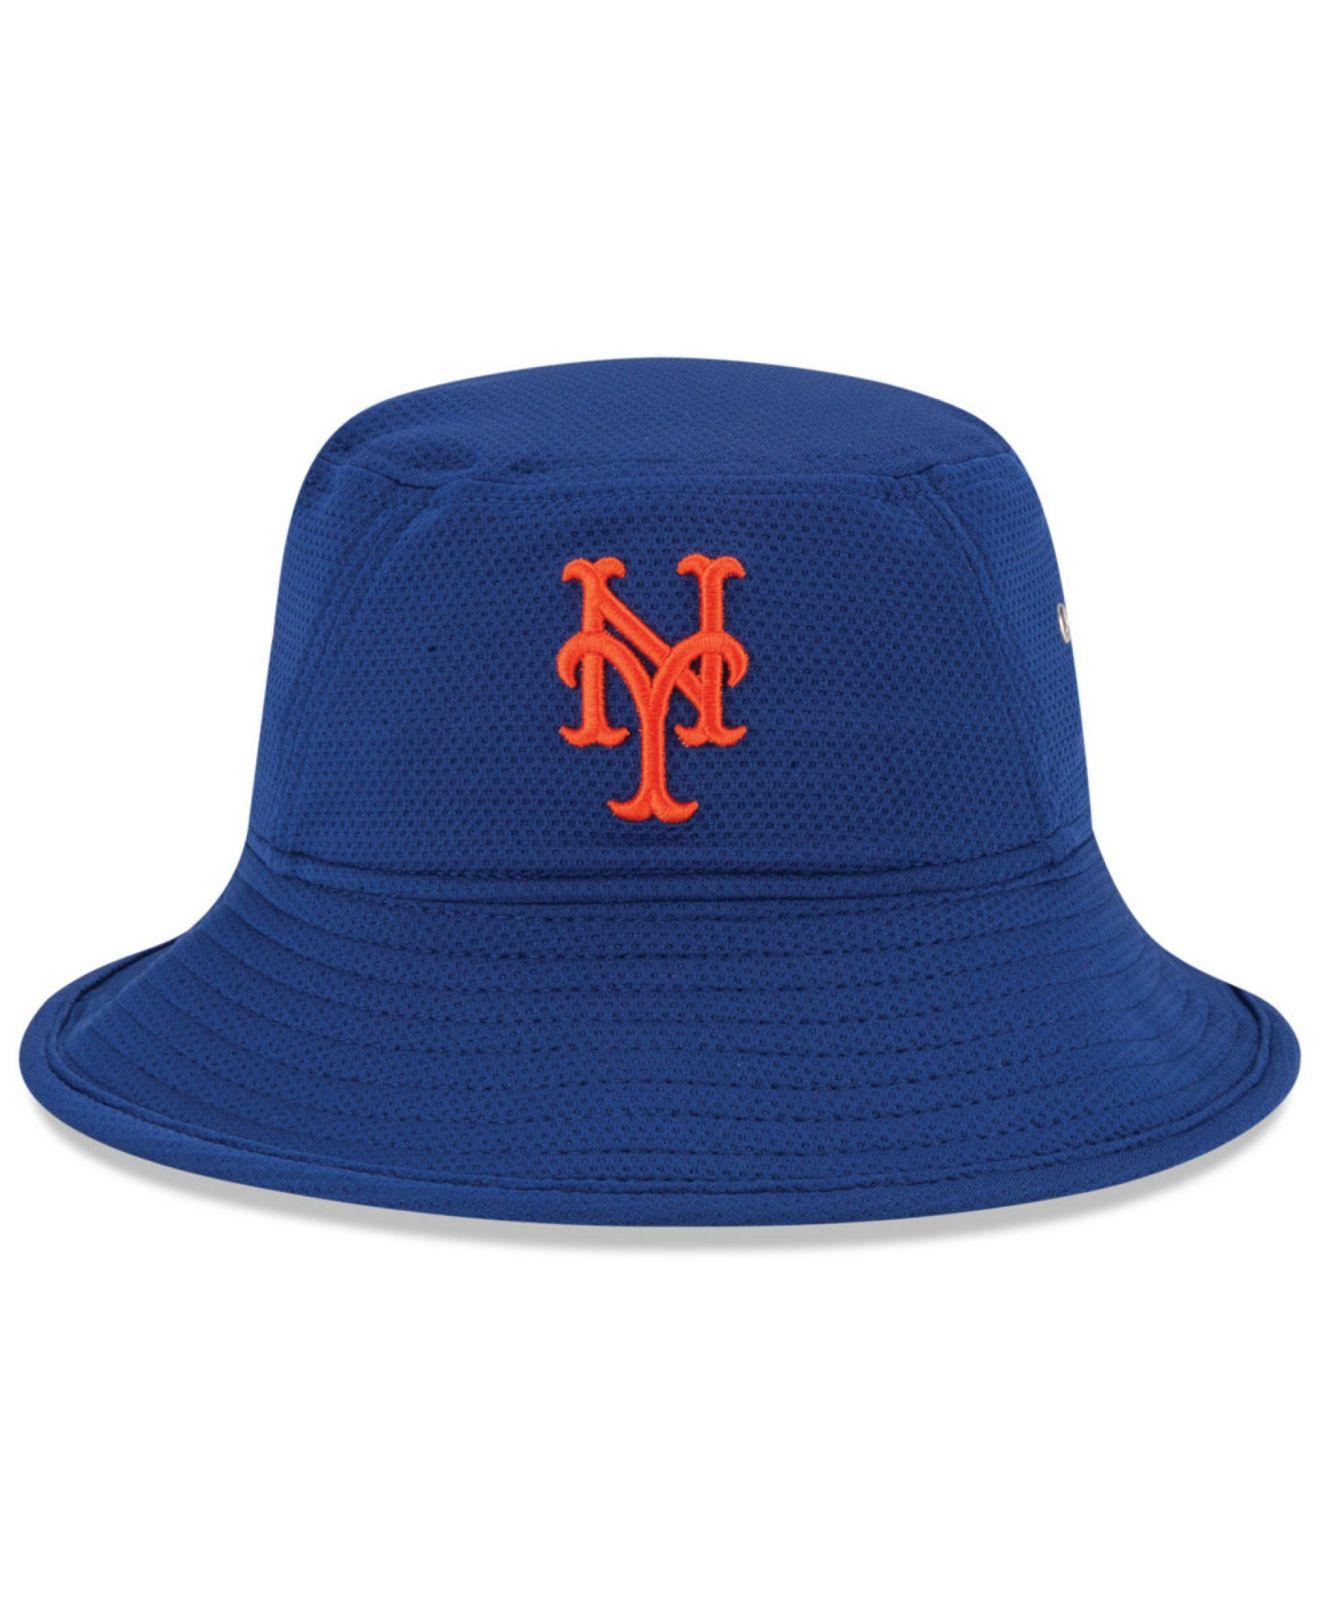 meet 94a33 419e0 closeout new new era york black mets mlb bucket dub cap dd4a1 508c3  uk lyst  ktz new york mets redux bucket hat in blue 6201e 941e2